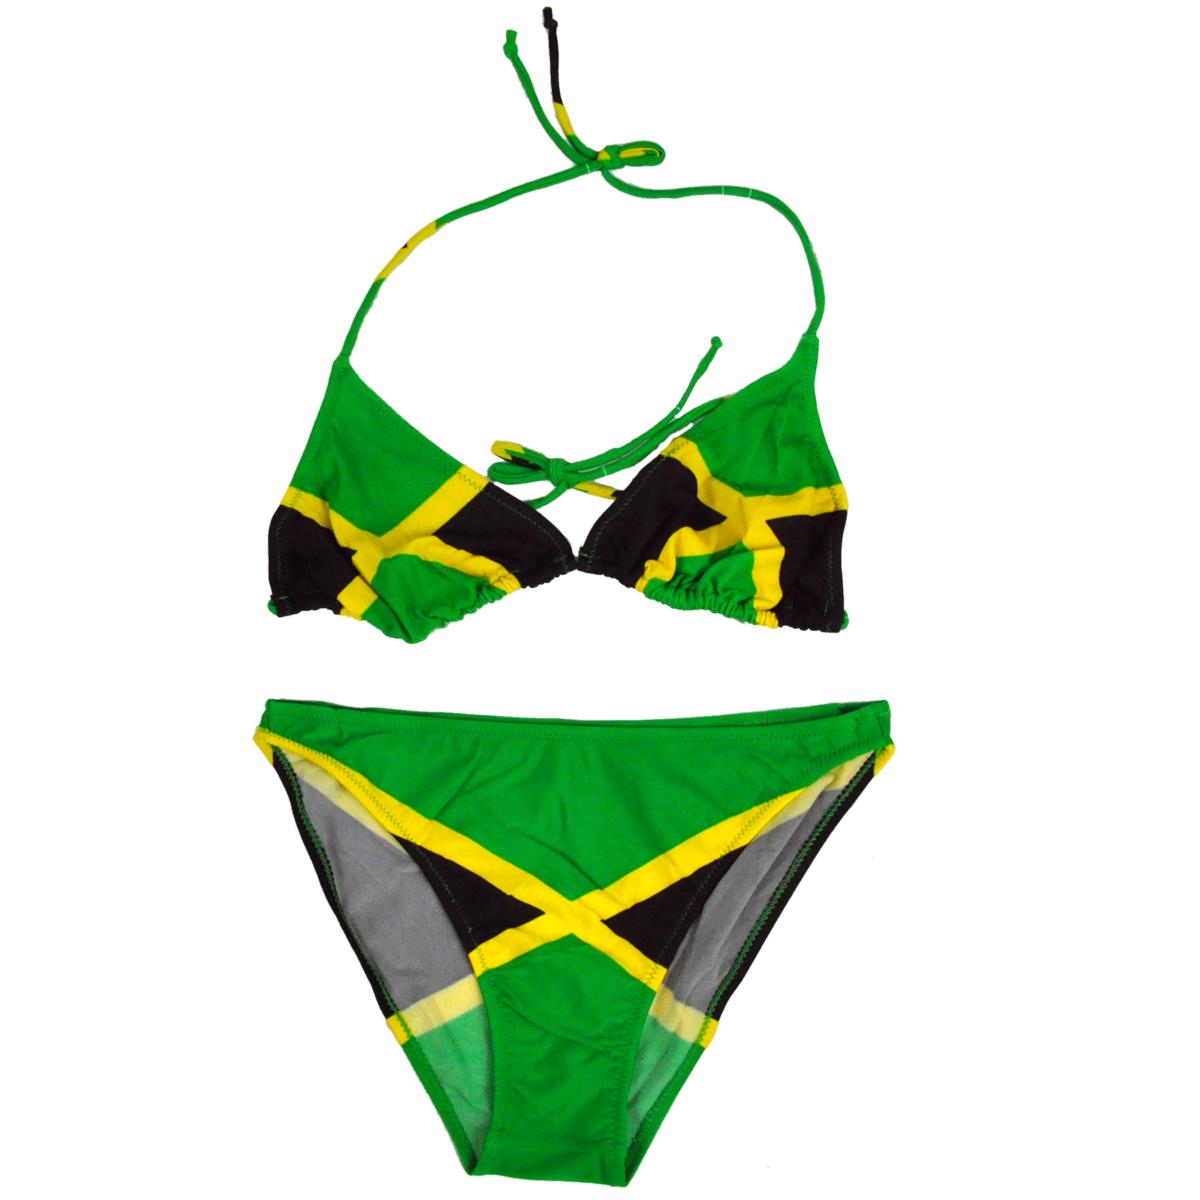 Jamaican flag bikini swimsuit show picture 1 voltagebd Gallery